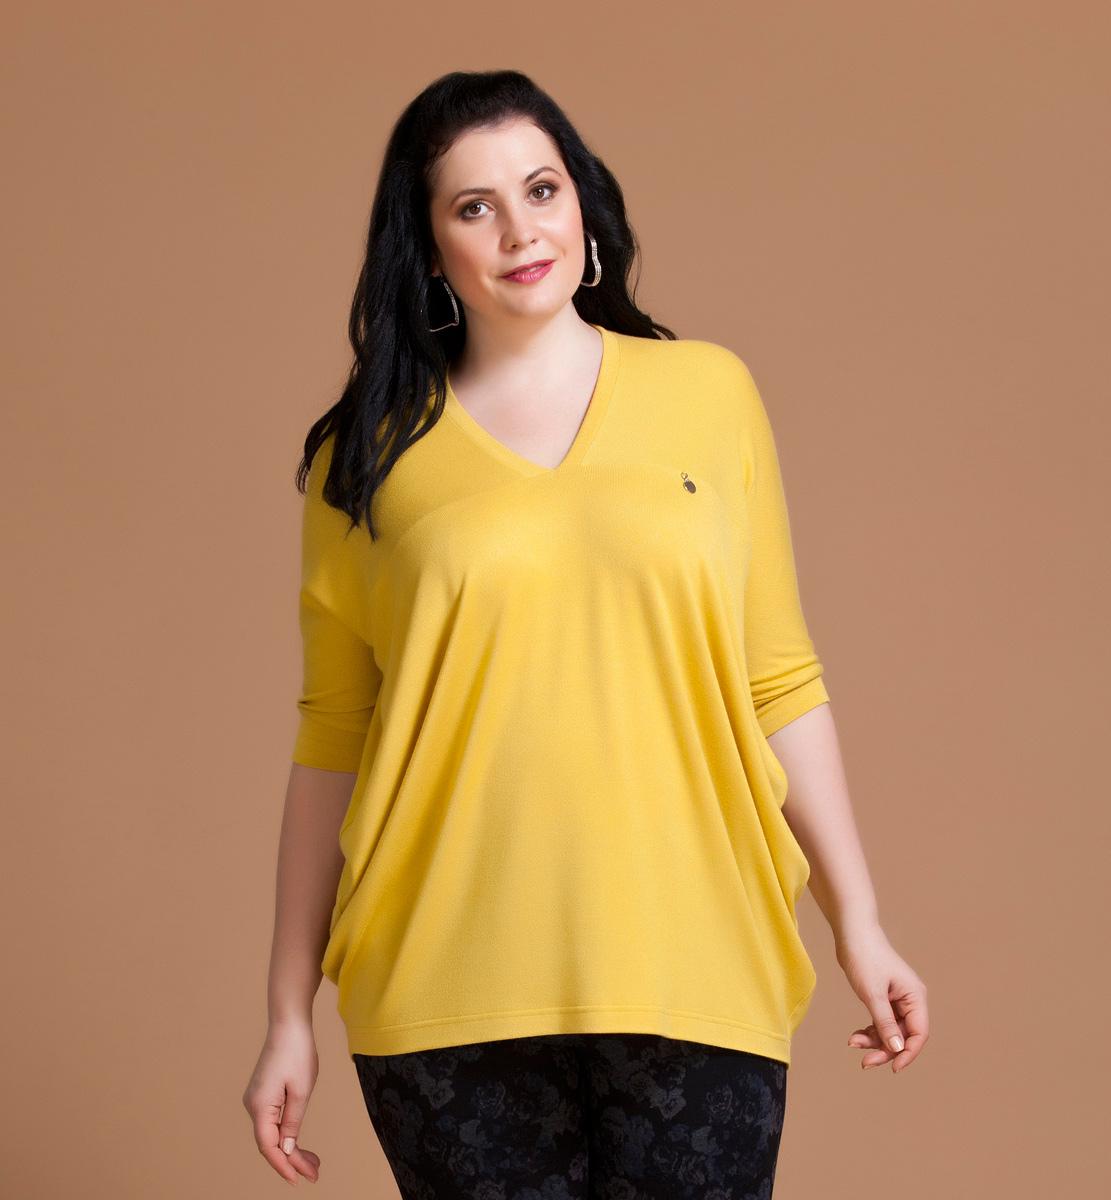 Блузка женская Averi, цвет: желтый. 1133. Размер 60 (64) блузка женская averi цвет оранжевый 1440 размер 64 66